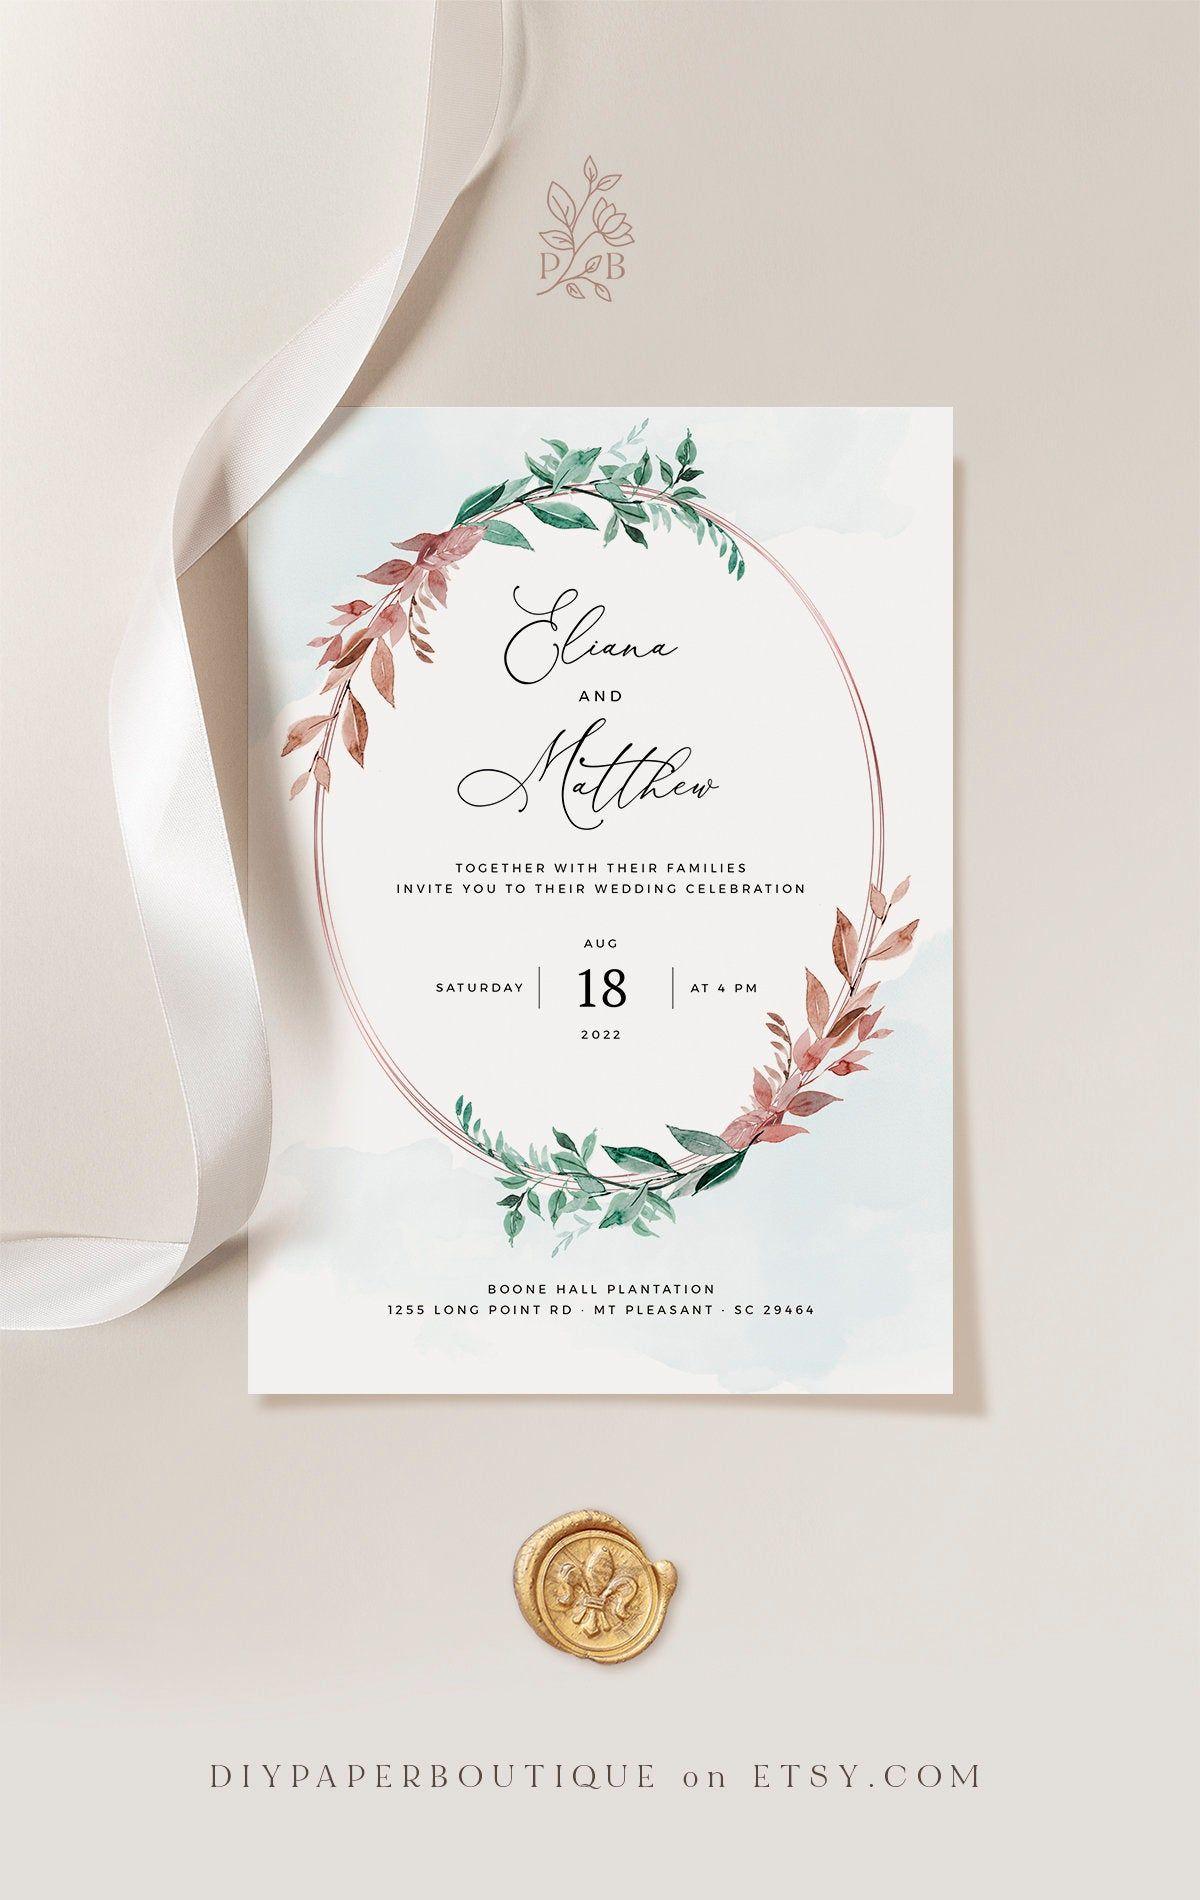 Yess Copper Sage Green Wedding Invitation Template Rustic Watercolor Editable Prin Wedding Invitation Templates Copper Invitation Wedding Invitation Design